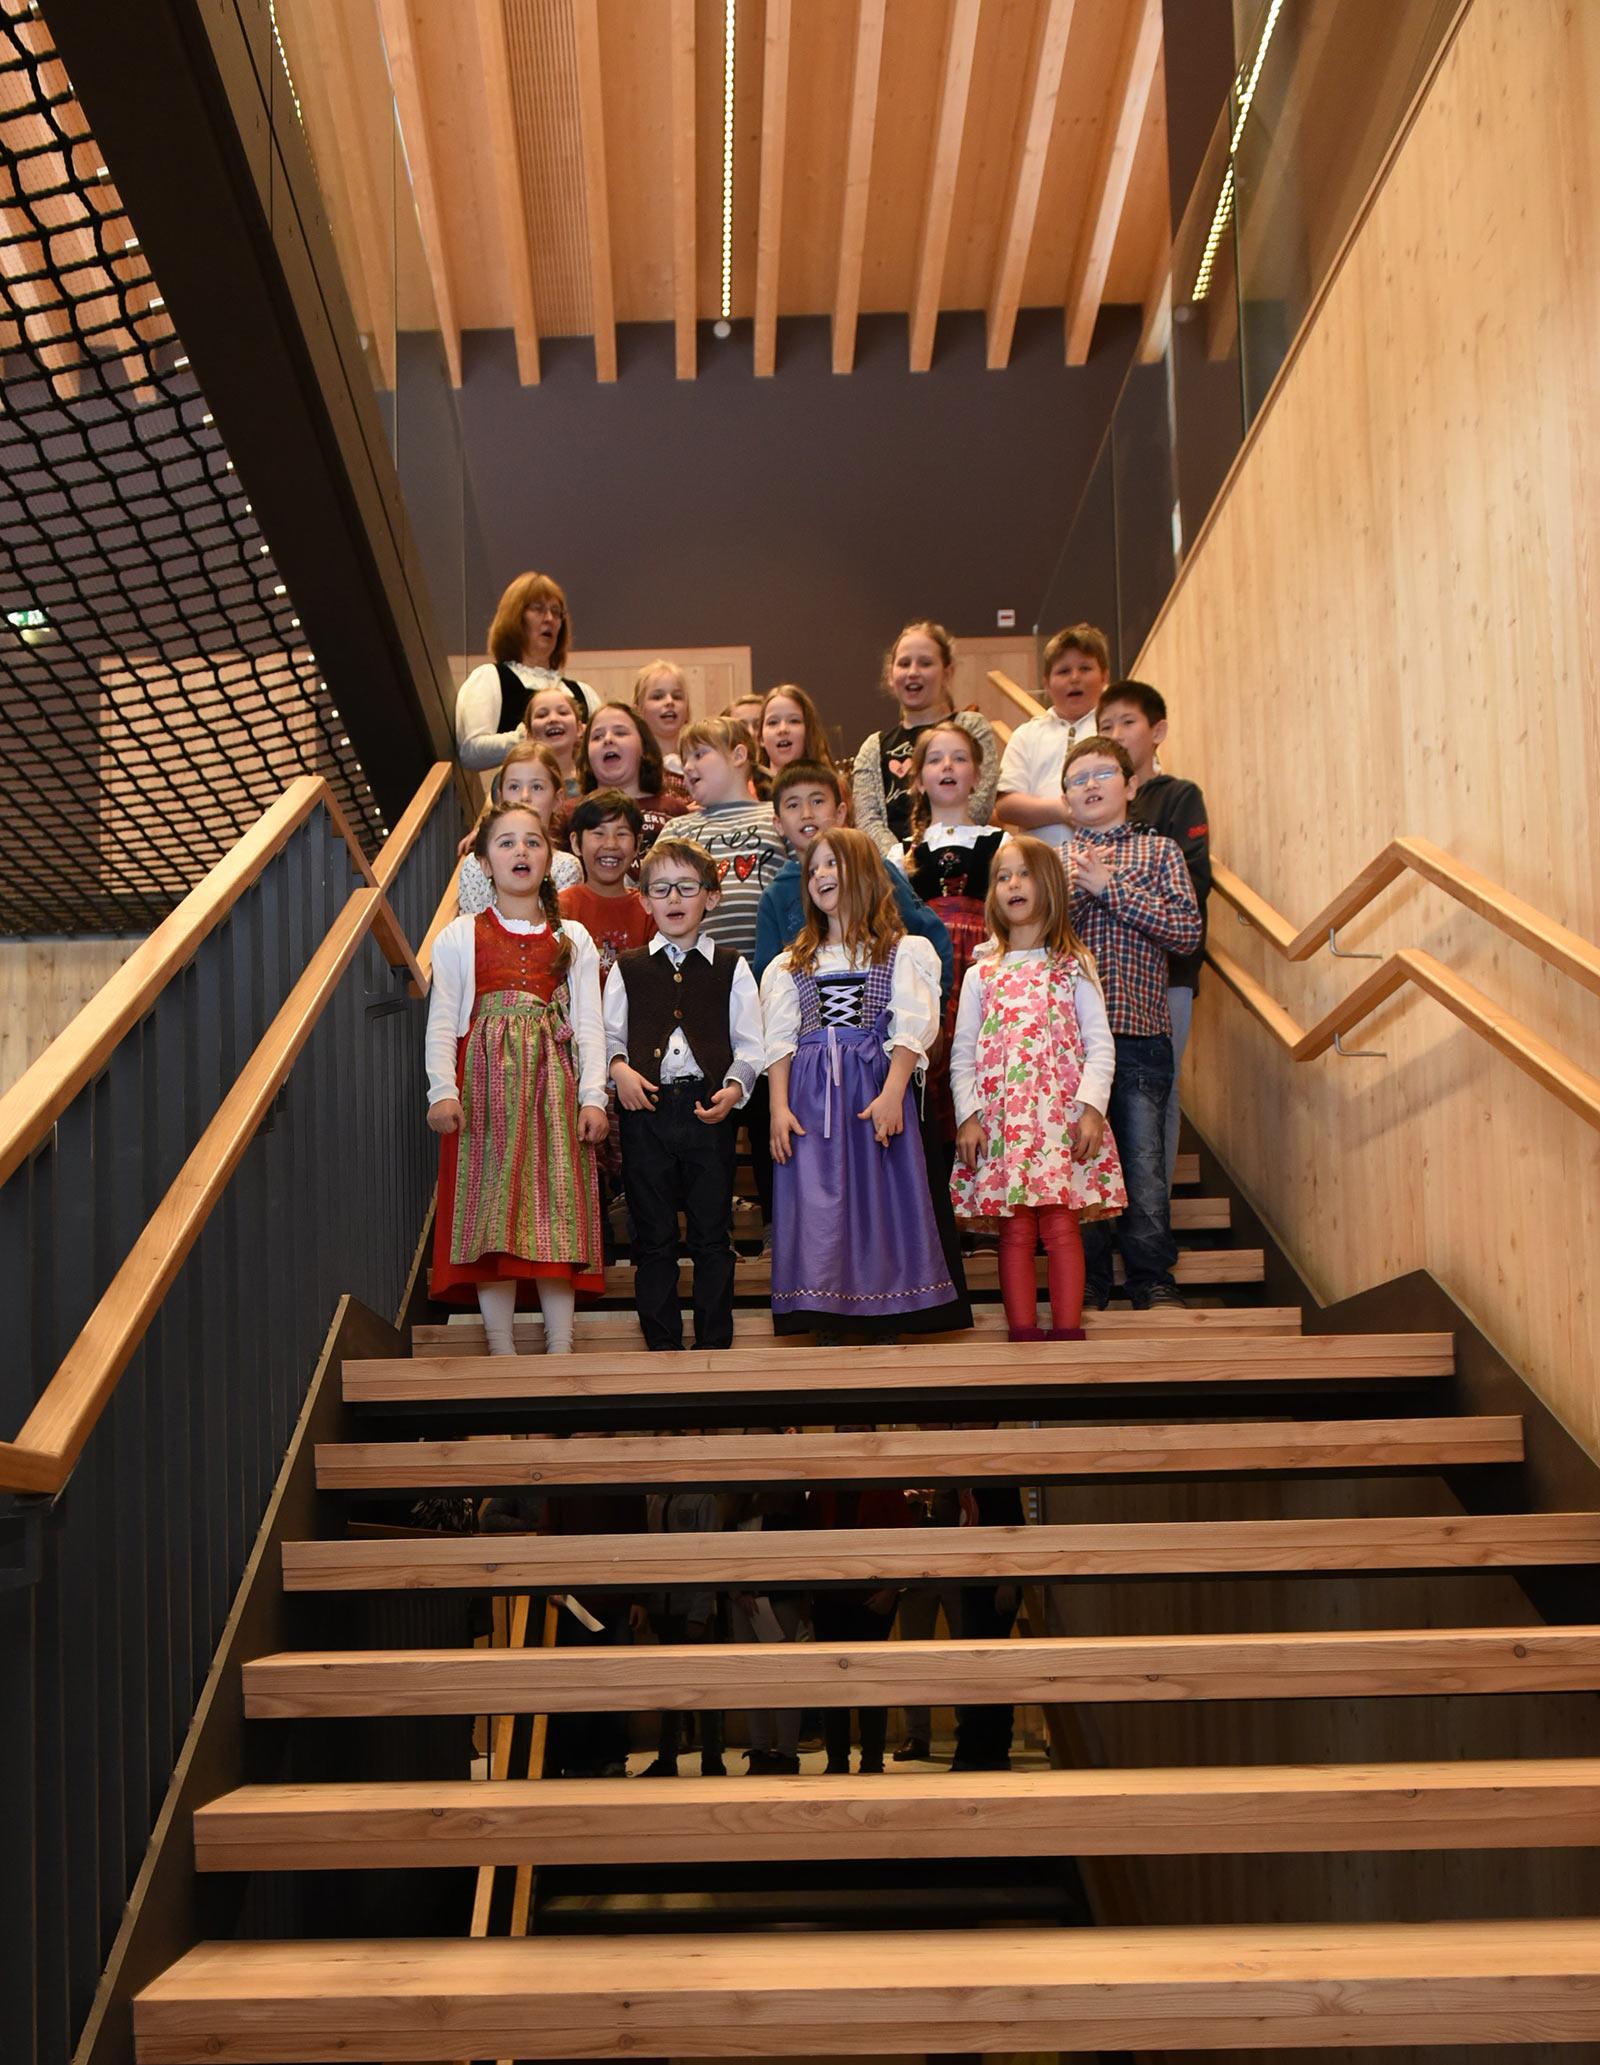 Children singing in the new school building. Photo: ATP